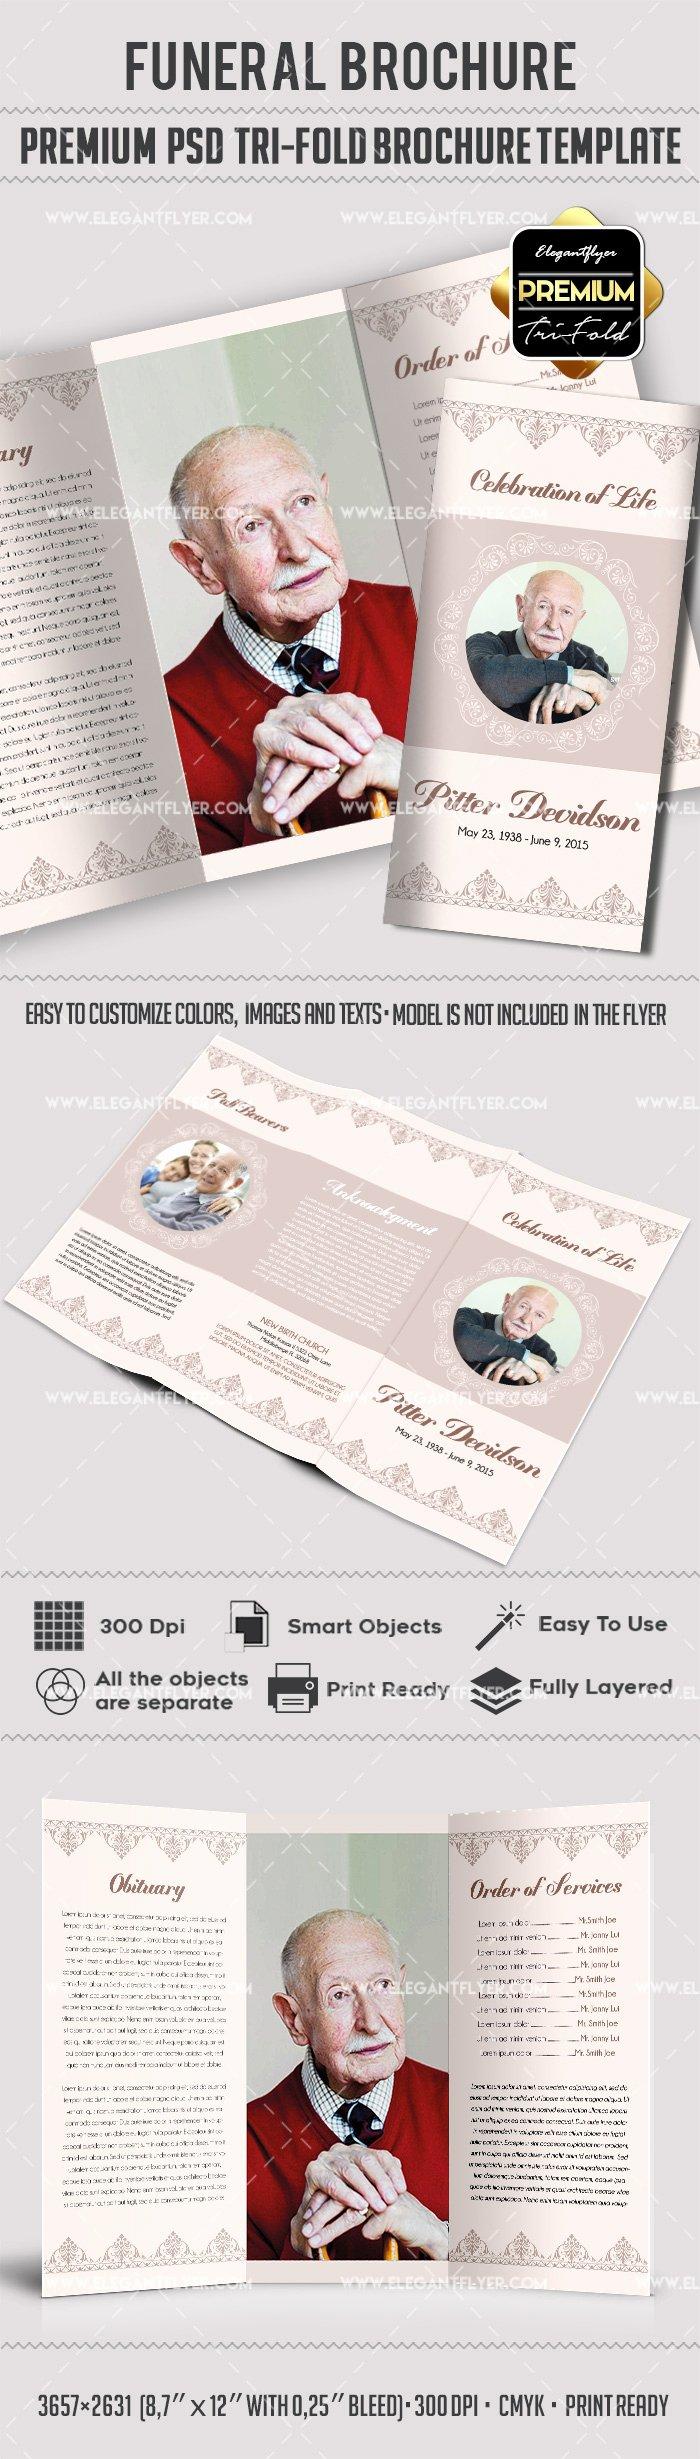 Tri Fold Brochure Free Template Best Of Tri Fold Funeral Service Brochure Template – by Elegantflyer